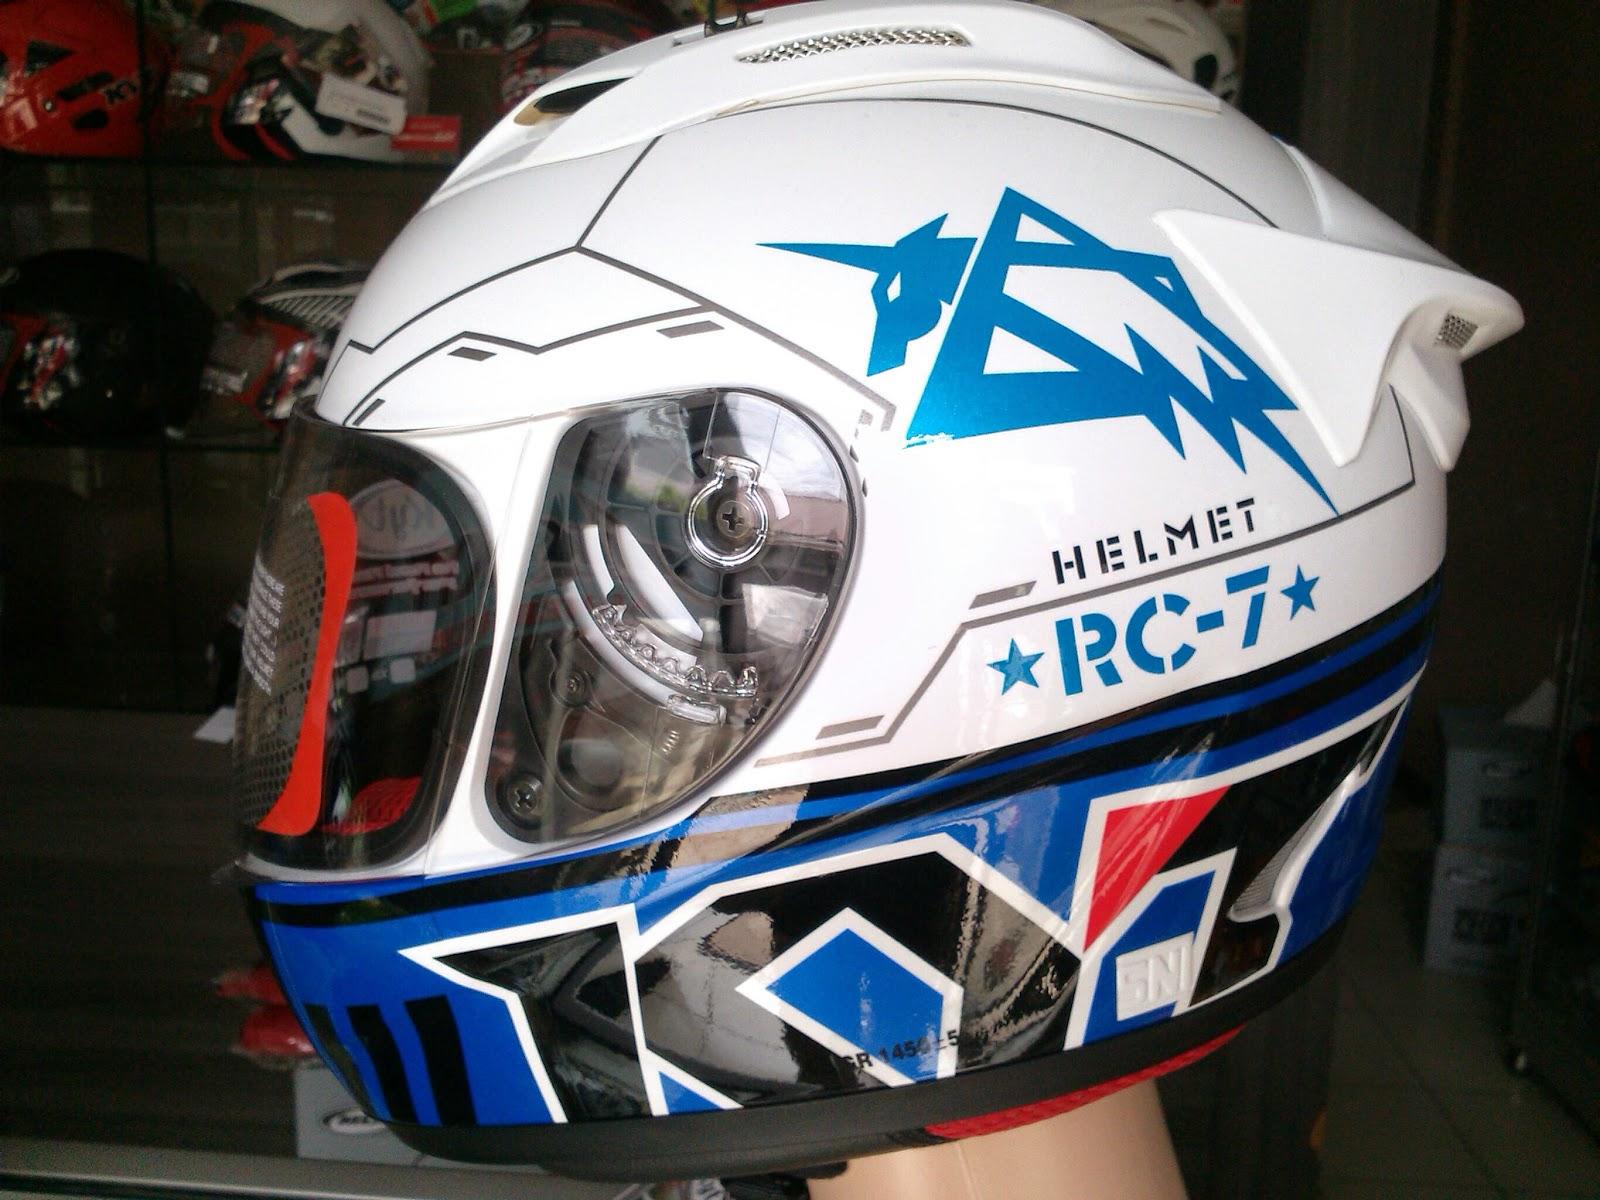 KYT RC 7 SERI 11 WHITE BLUE. almer helmet. HELM KYT RC7 RC 7